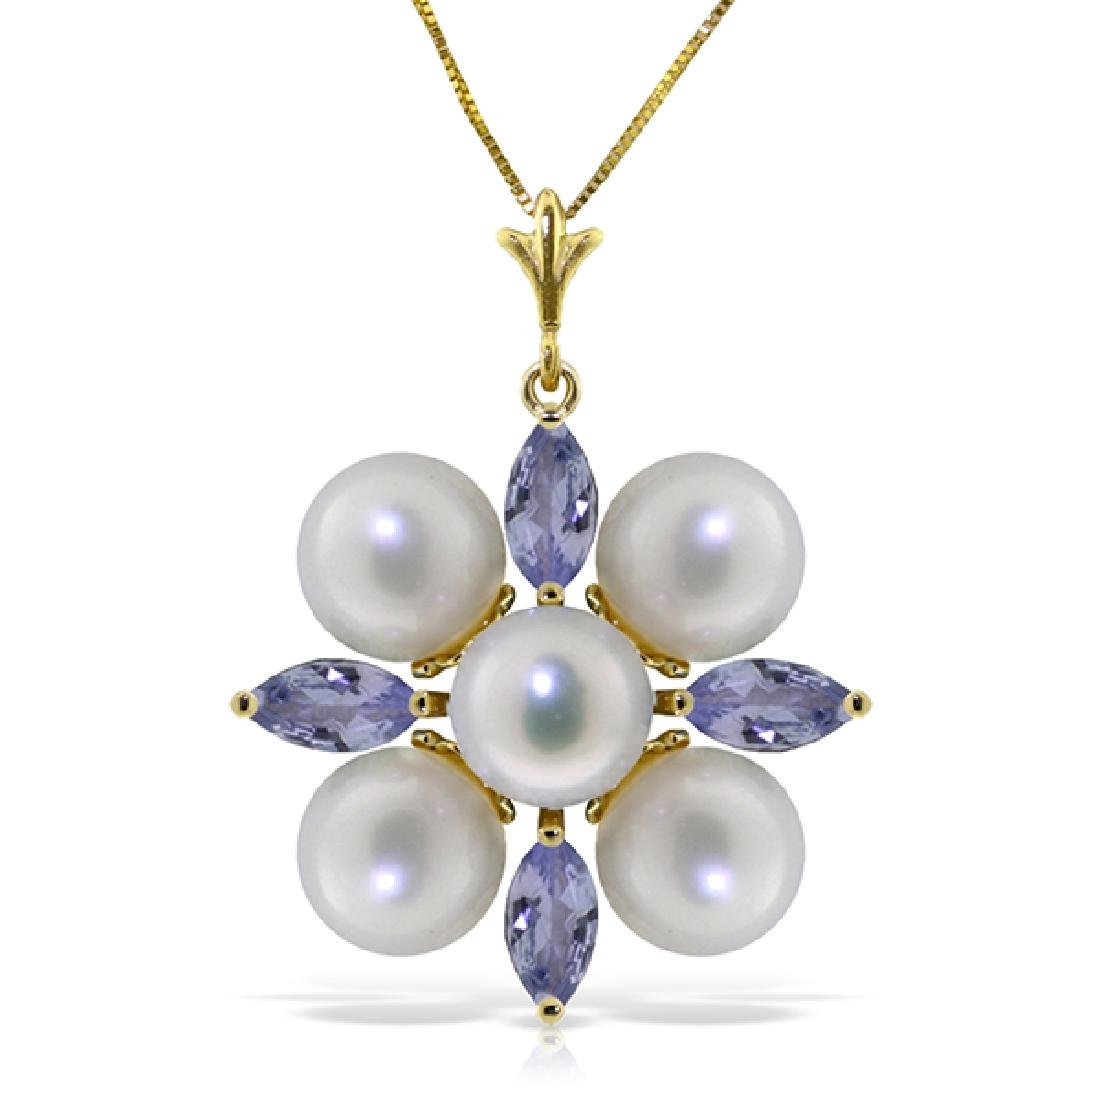 Genuine 6.3 ctw Tanzanite & Pearl Necklace Jewelry 14KT